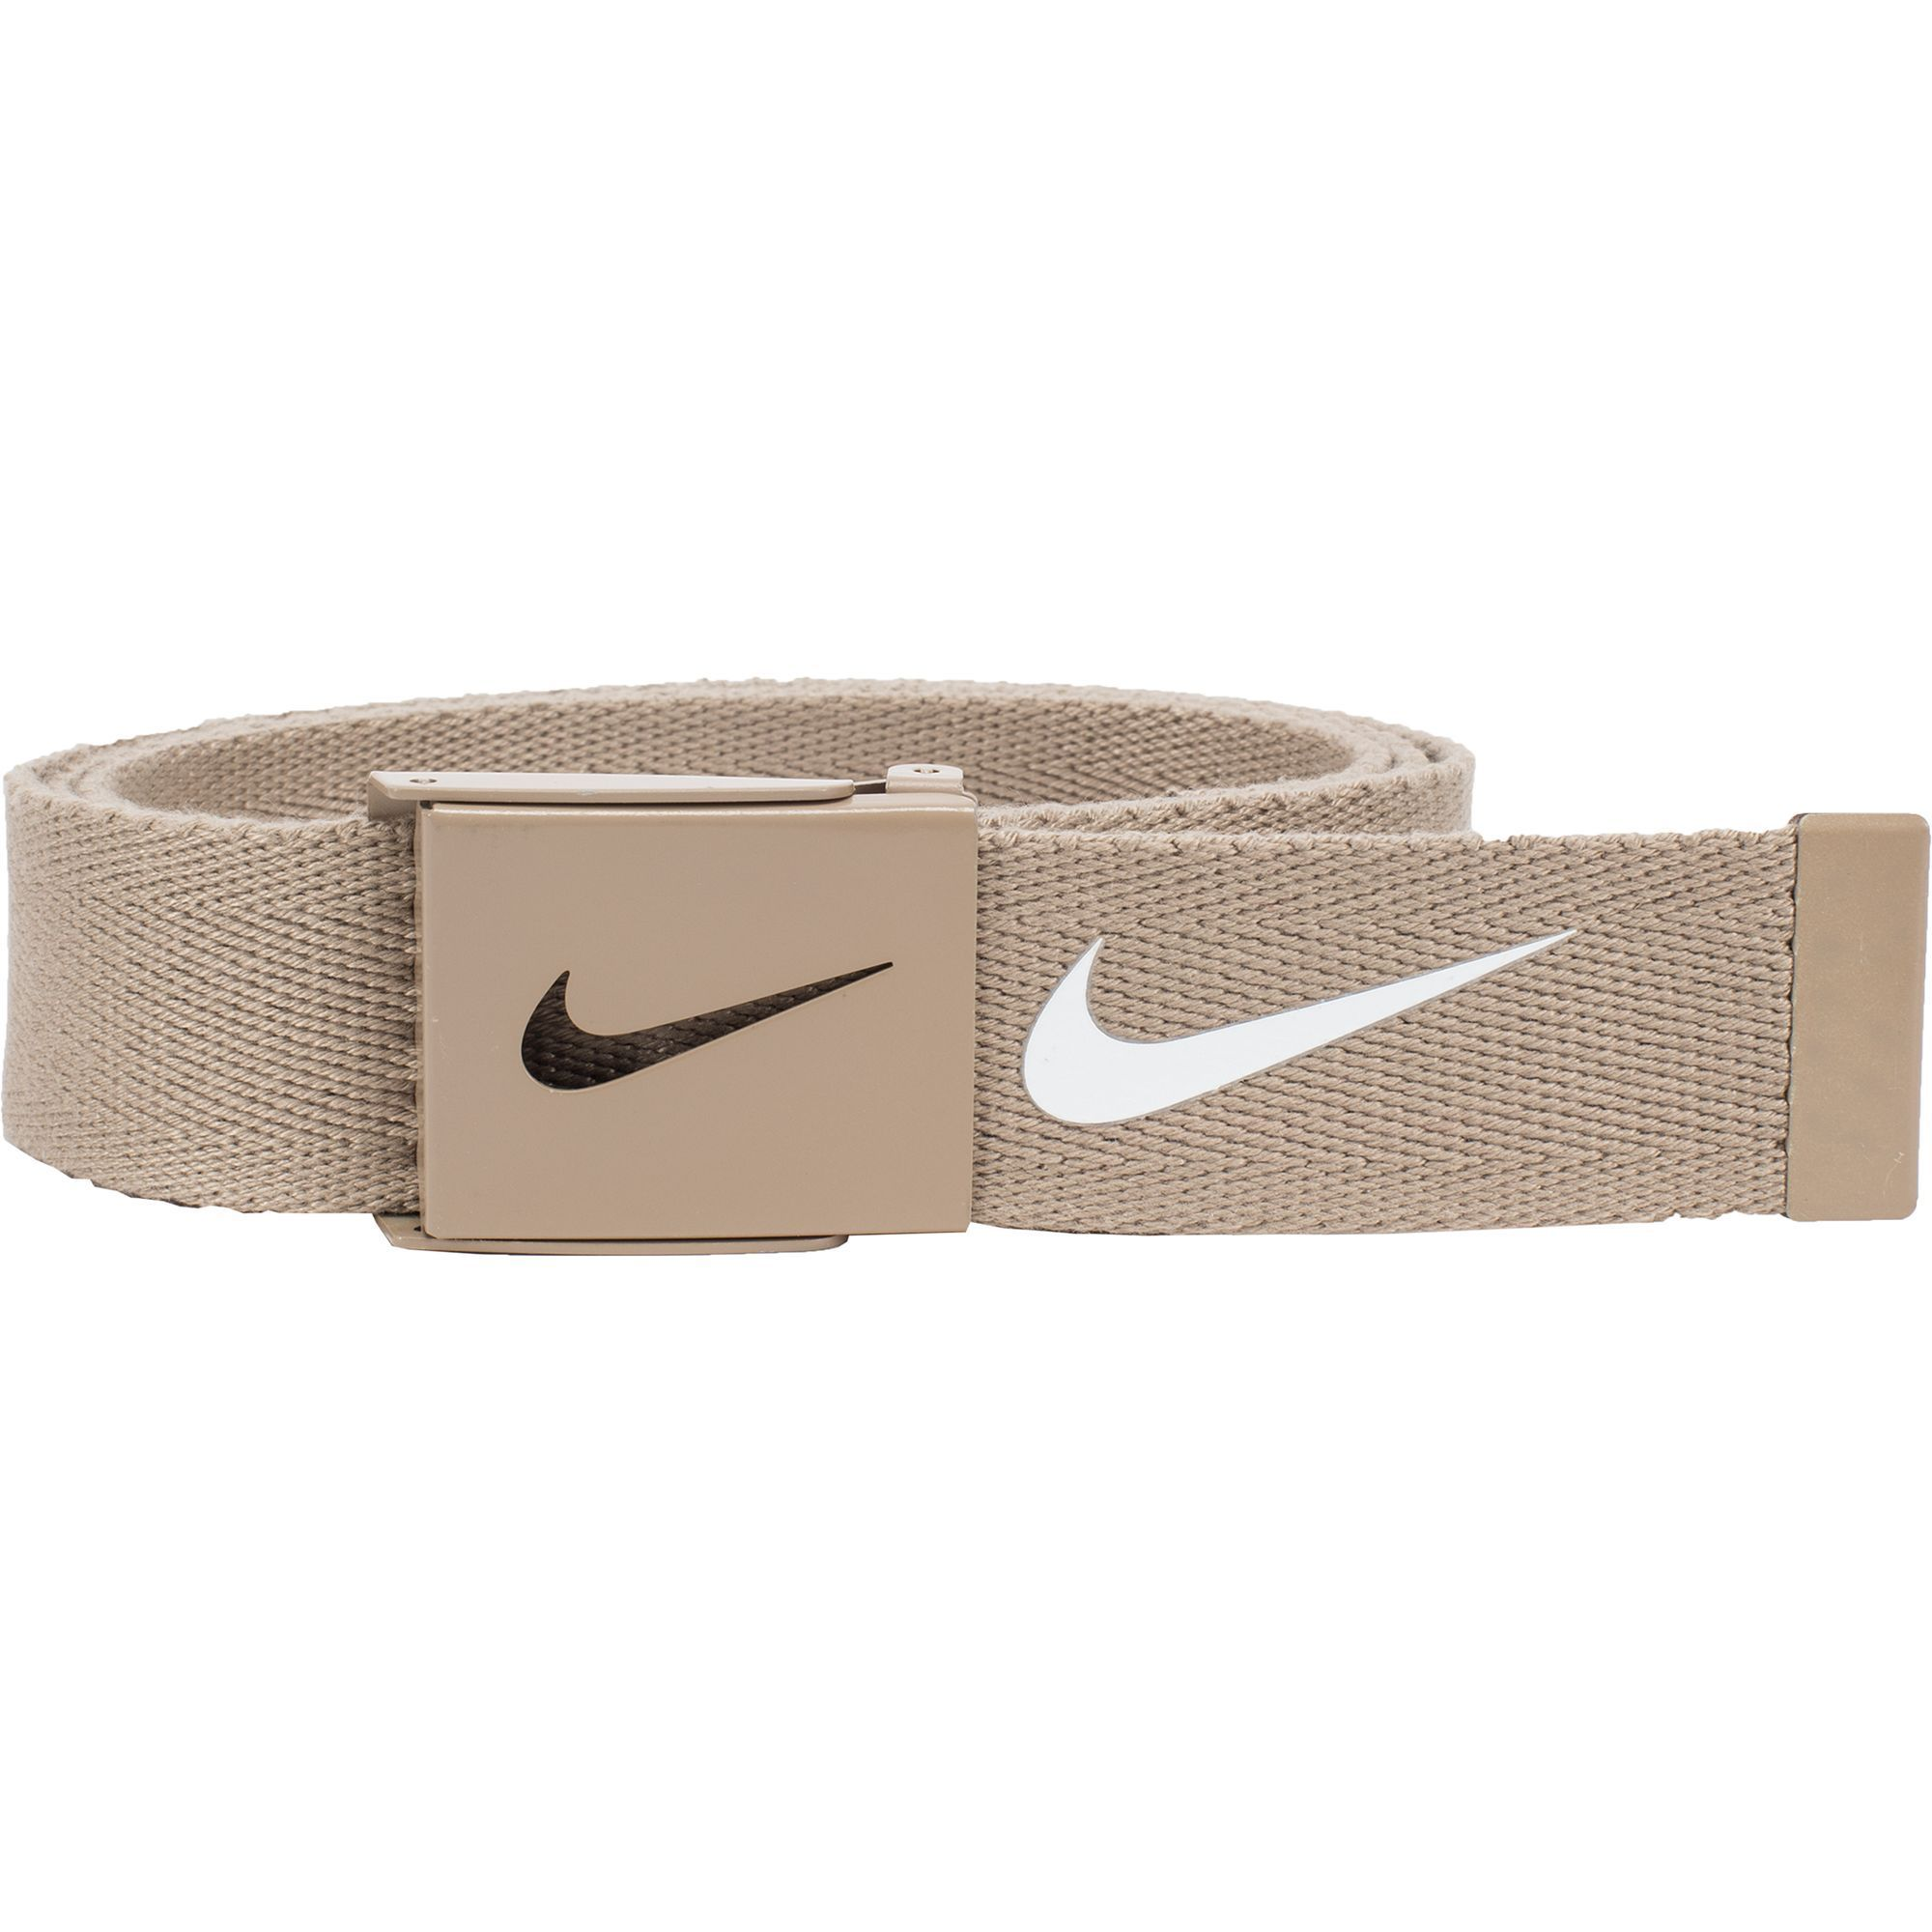 Men's Nike Golf Web Belt, Beig/Green (Beig/Khaki)